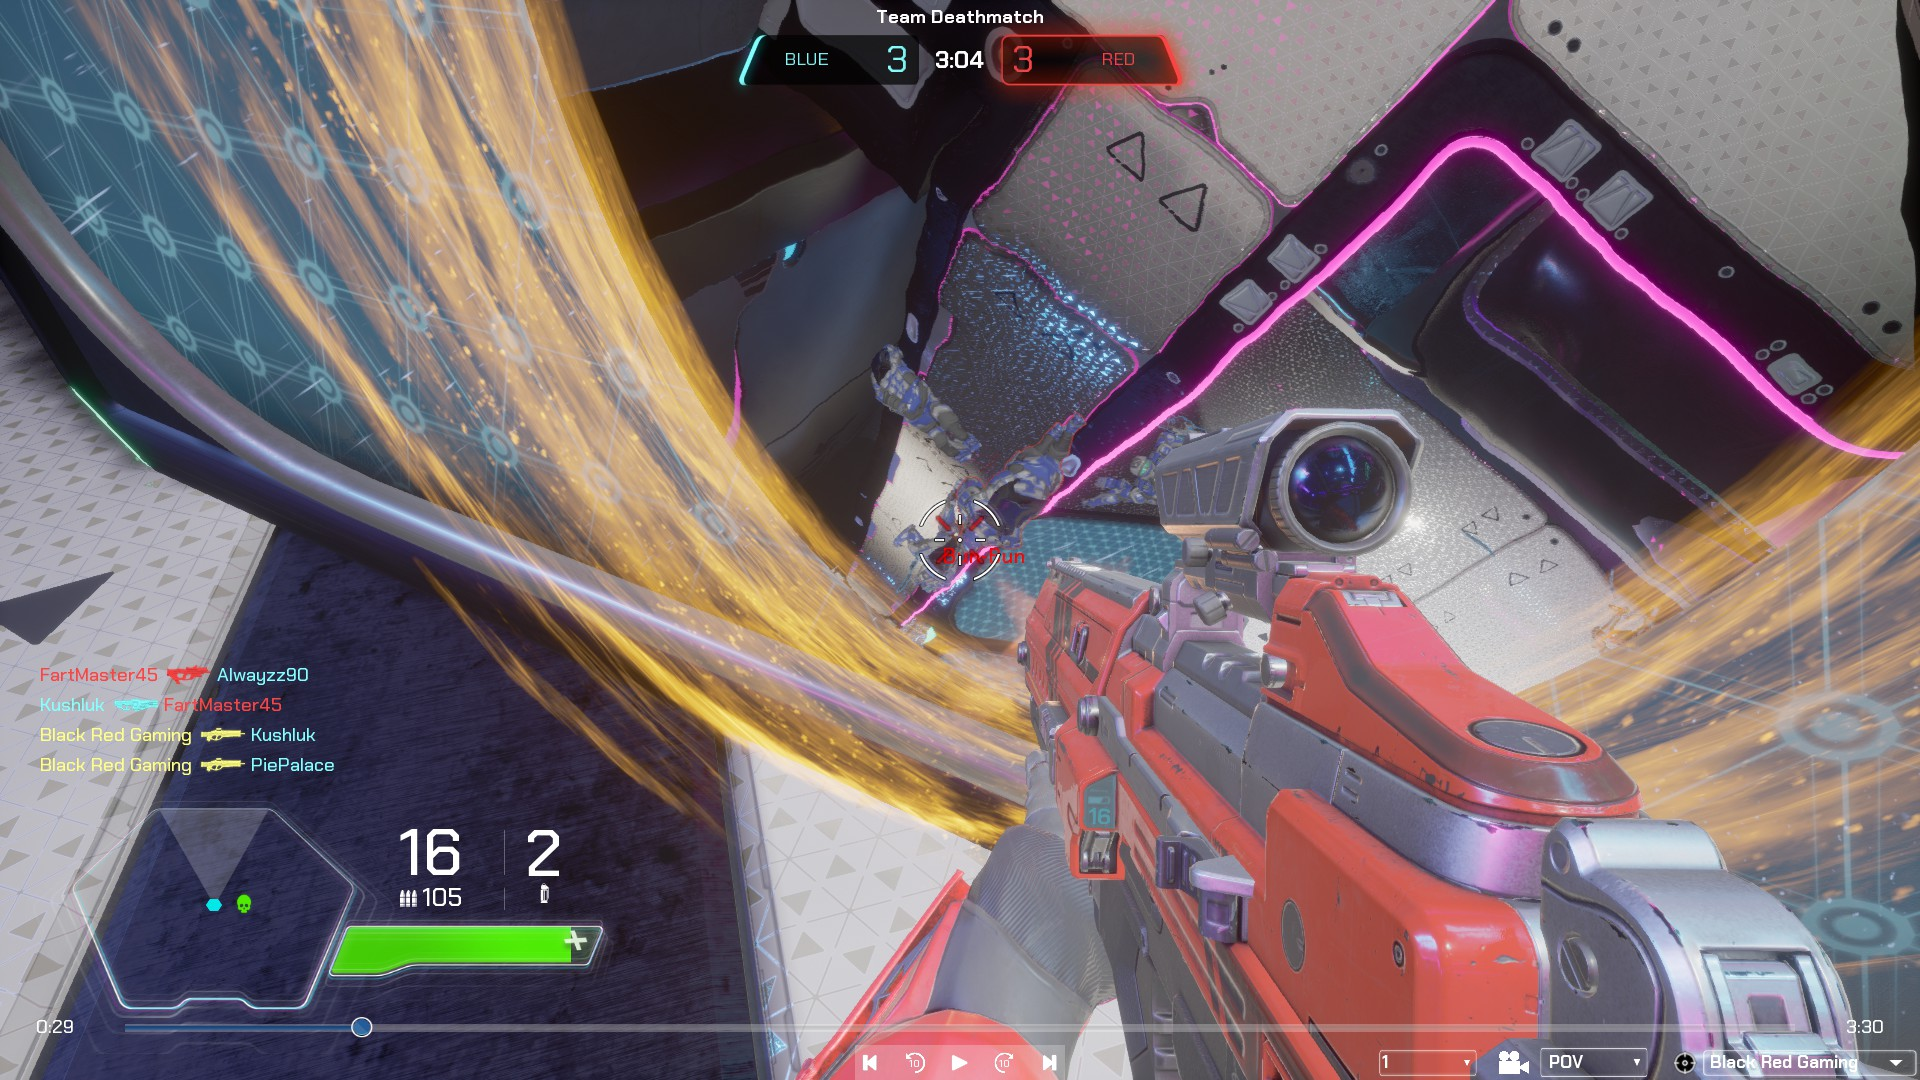 Getting the drop on enemies is really satisfying.